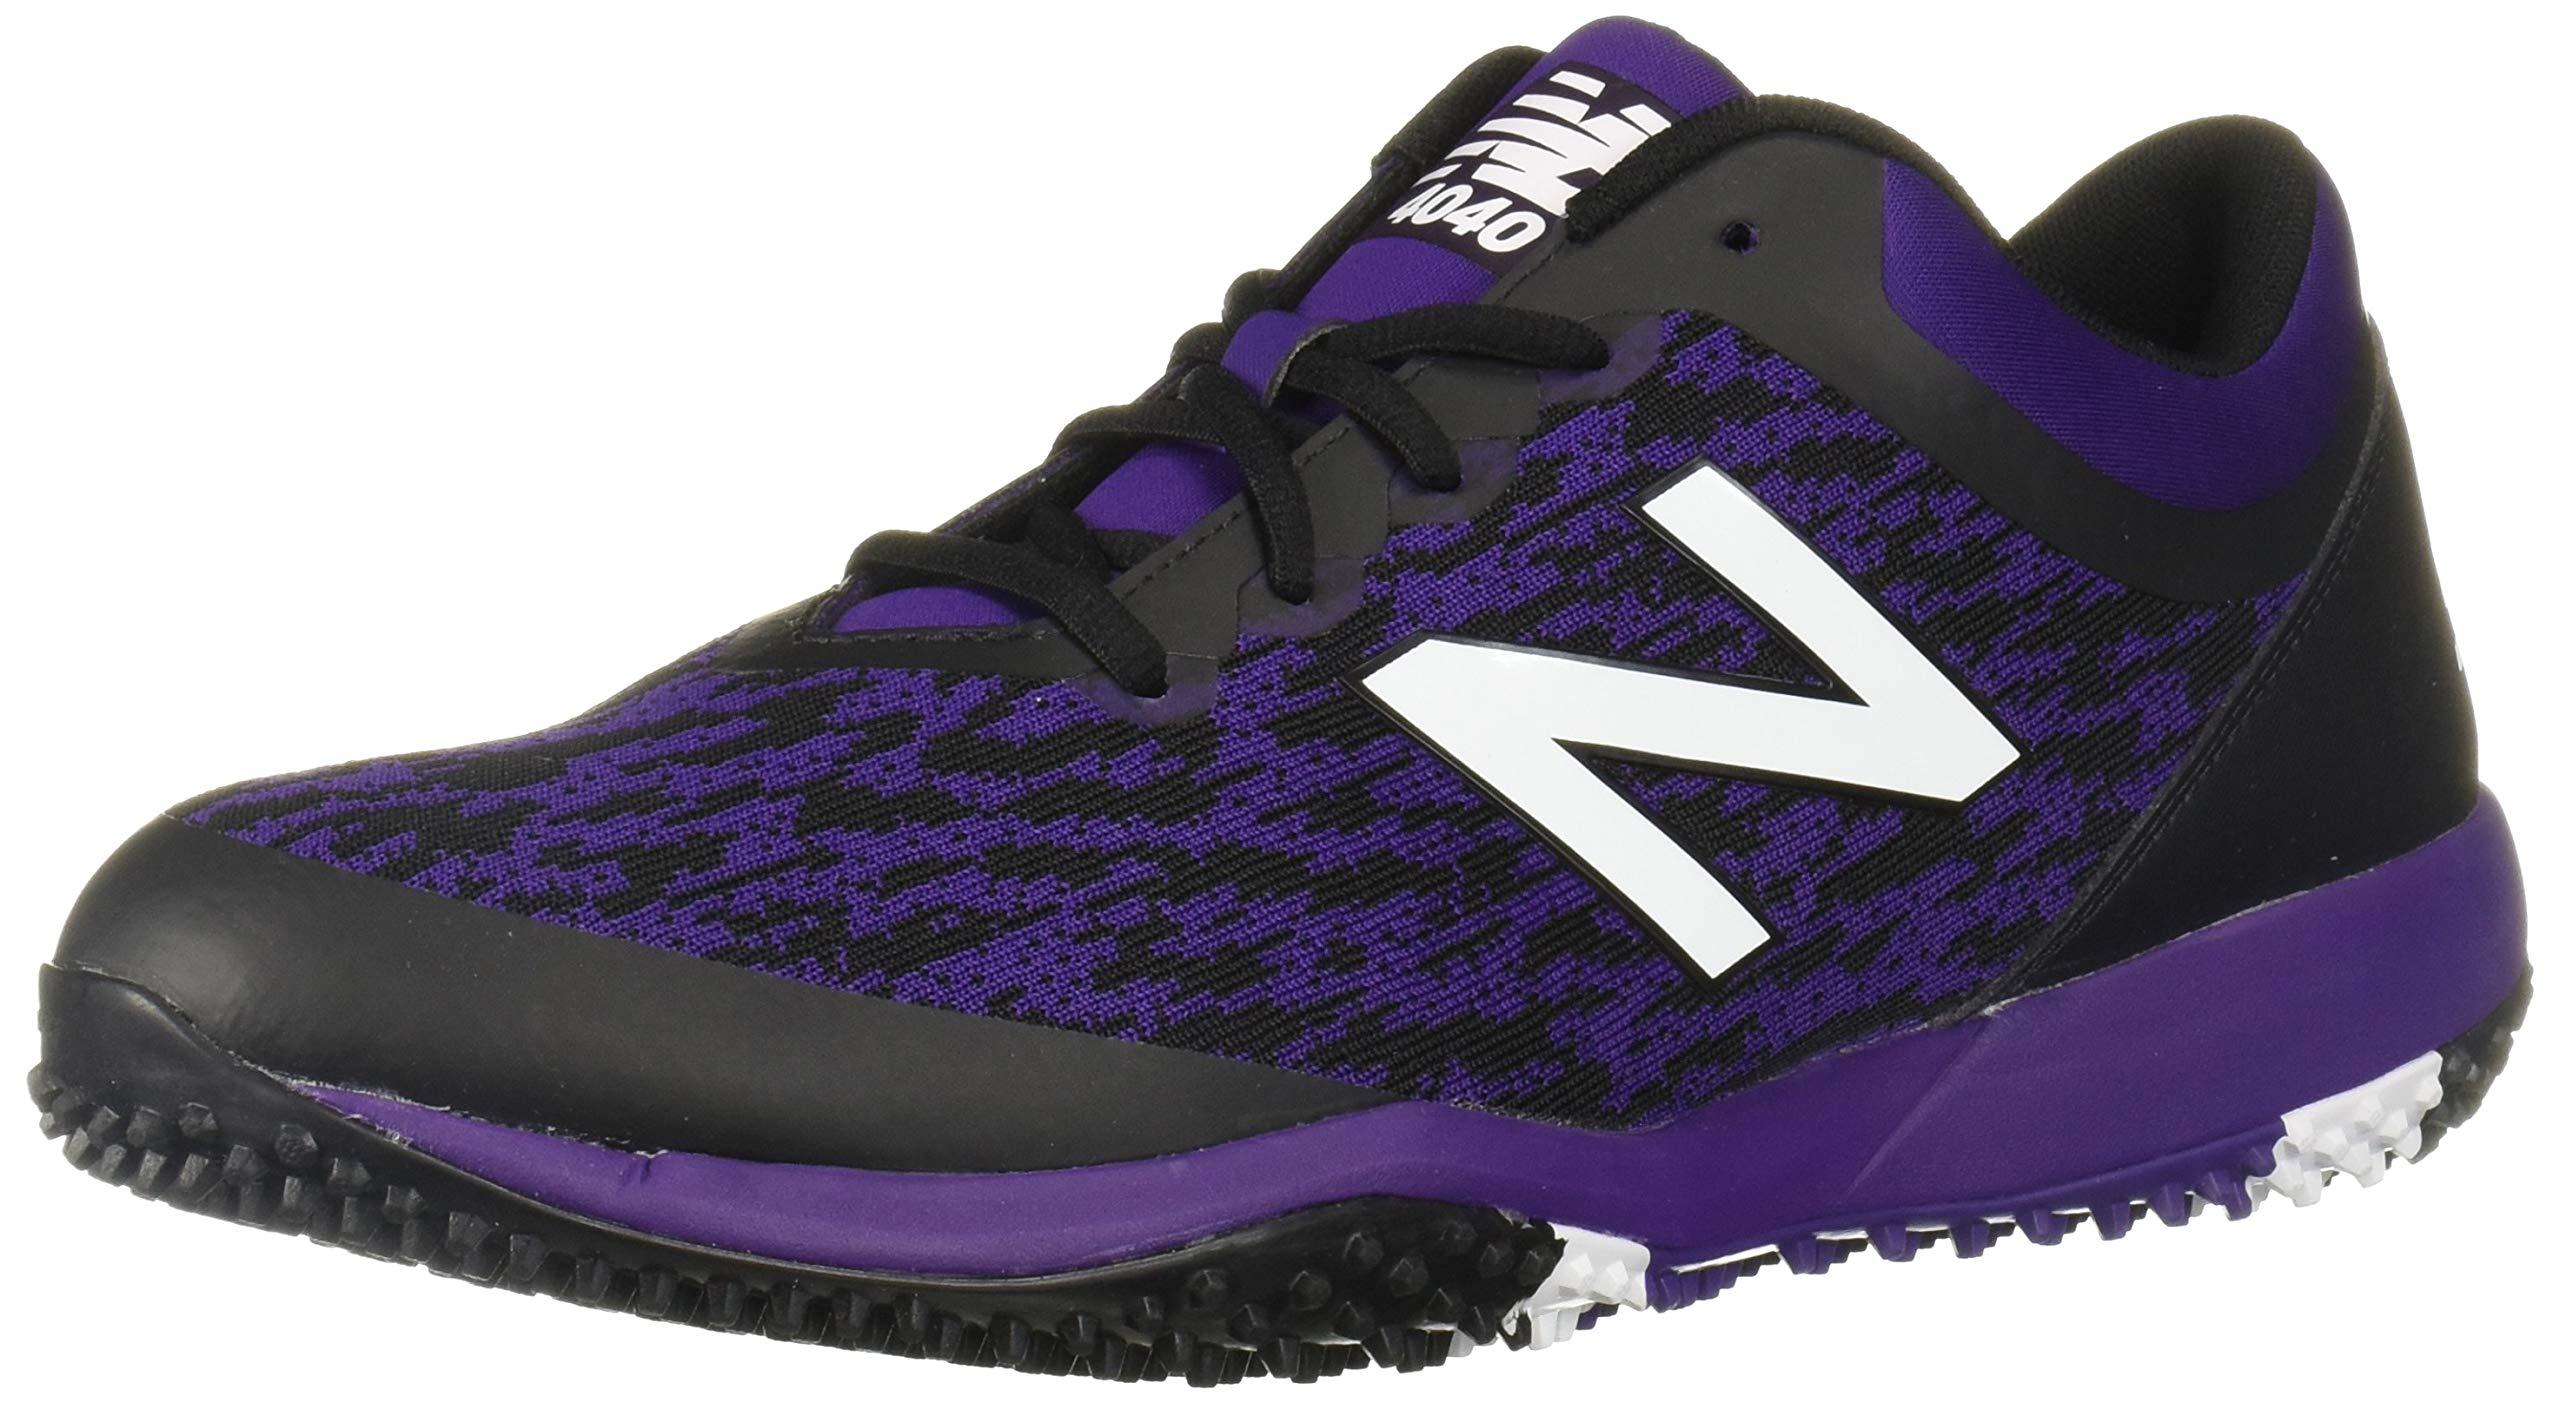 New Balance Men's 4040v5 Turf Track and Field Shoe, Black/Purple, 8.5 2E US by New Balance